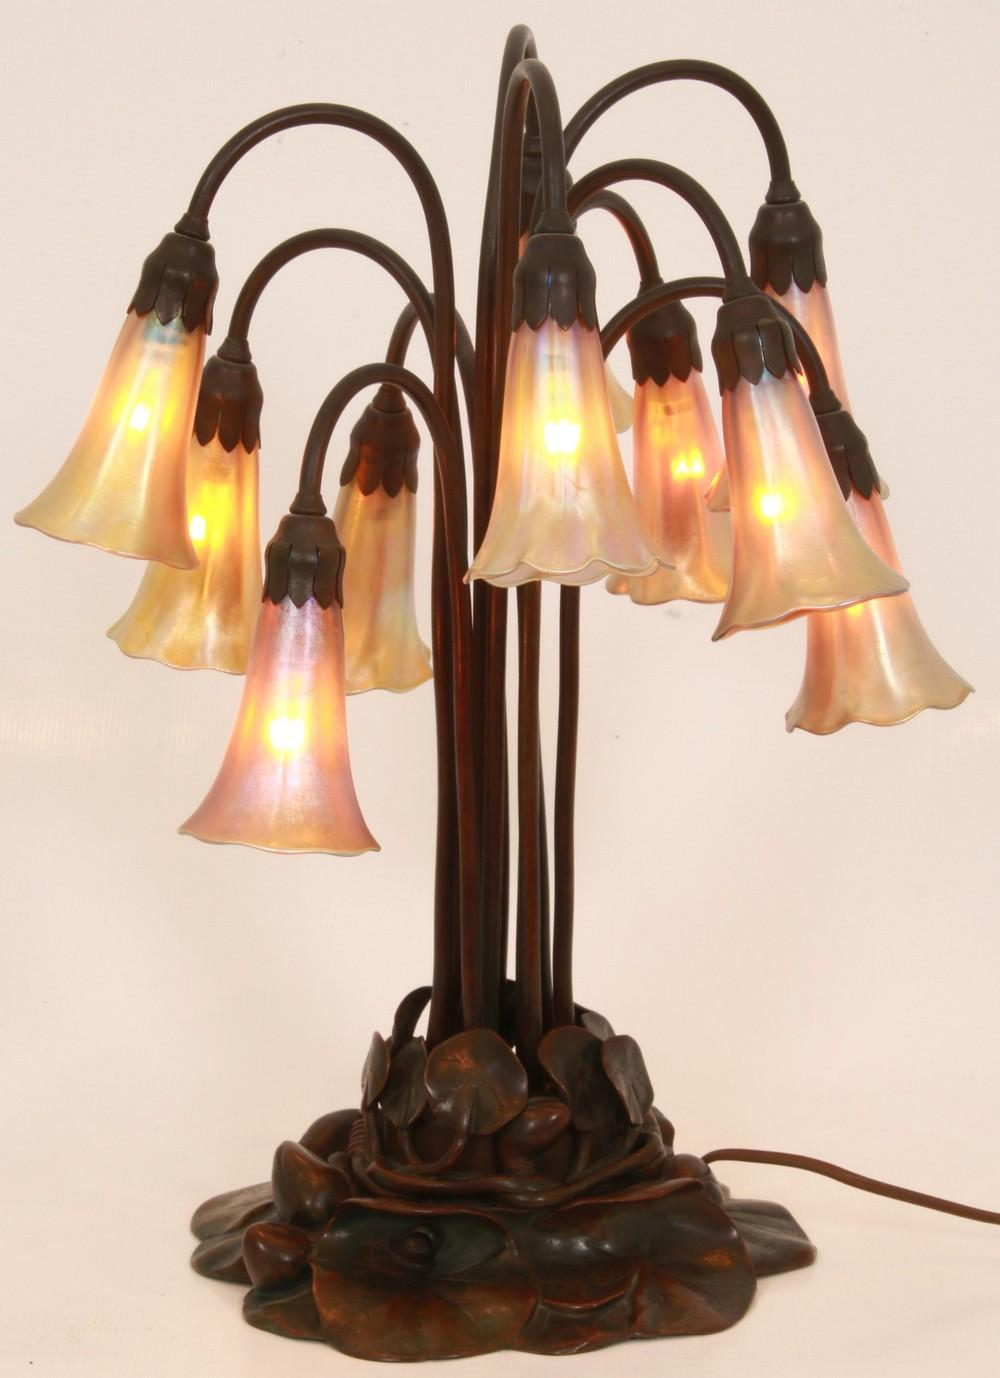 Tiffany Studios 10 Light Lily Lamp